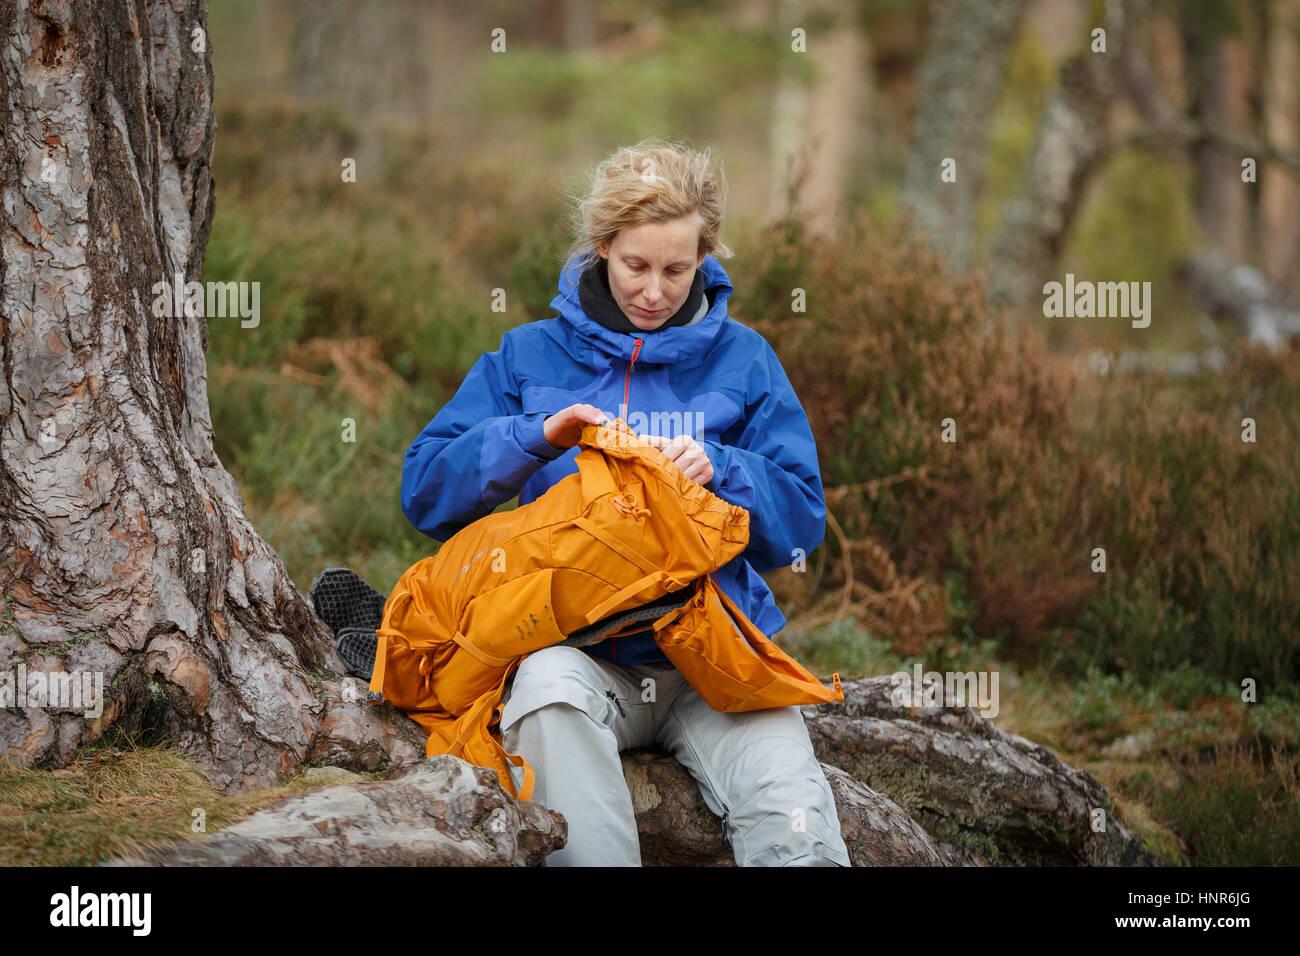 Frau in Schottland wandern Stockbild